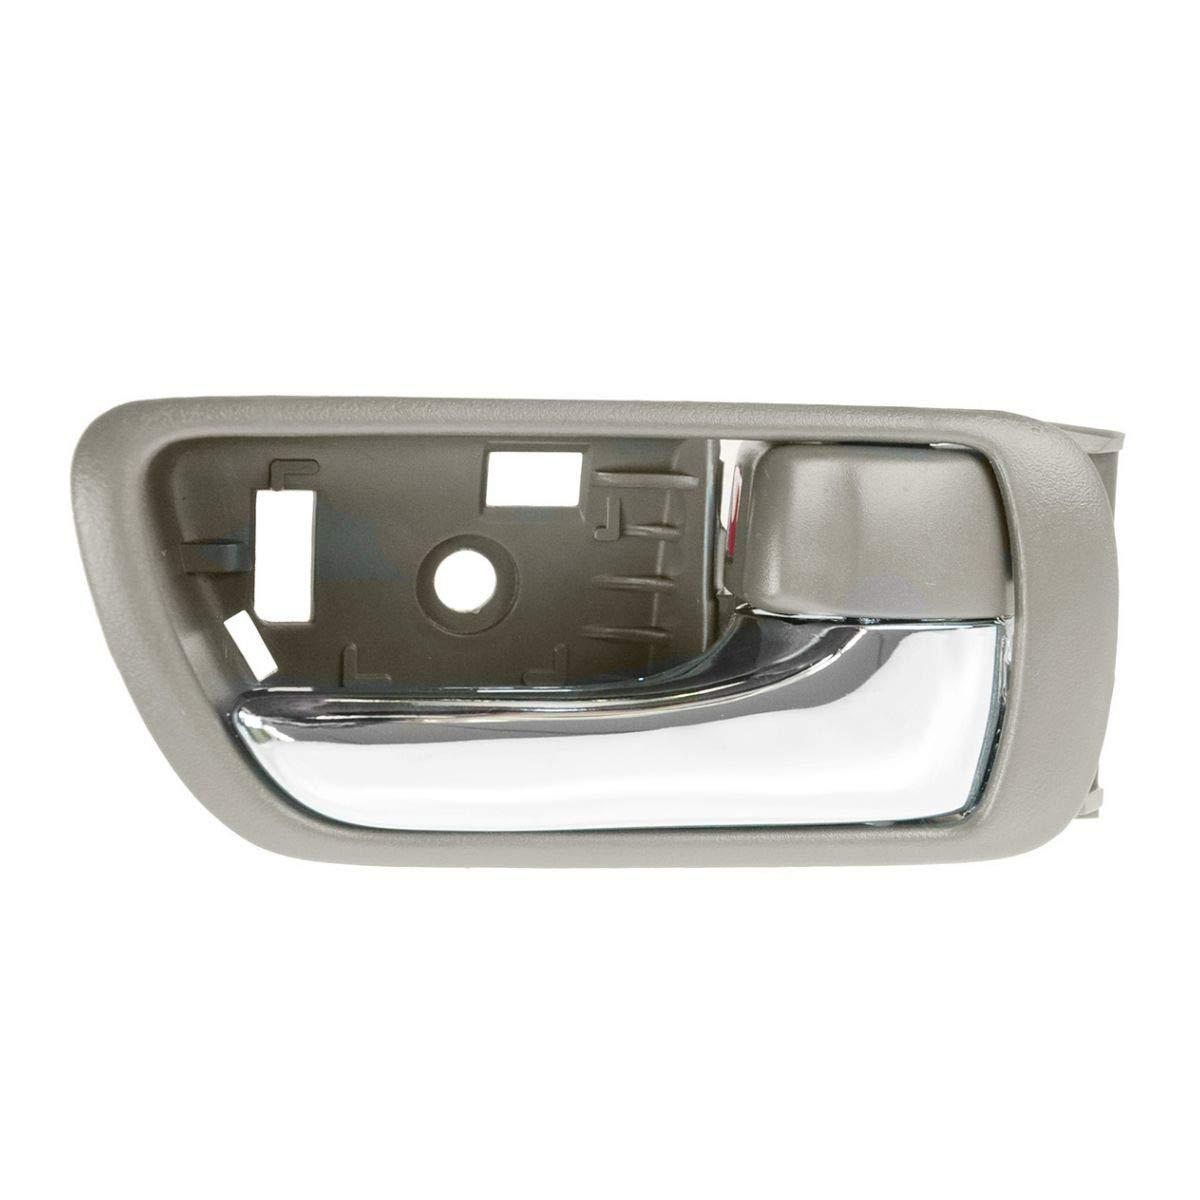 Inside Door Handle Black LH Driver RH Passenger PAIR for 02-06 Toyota Camry